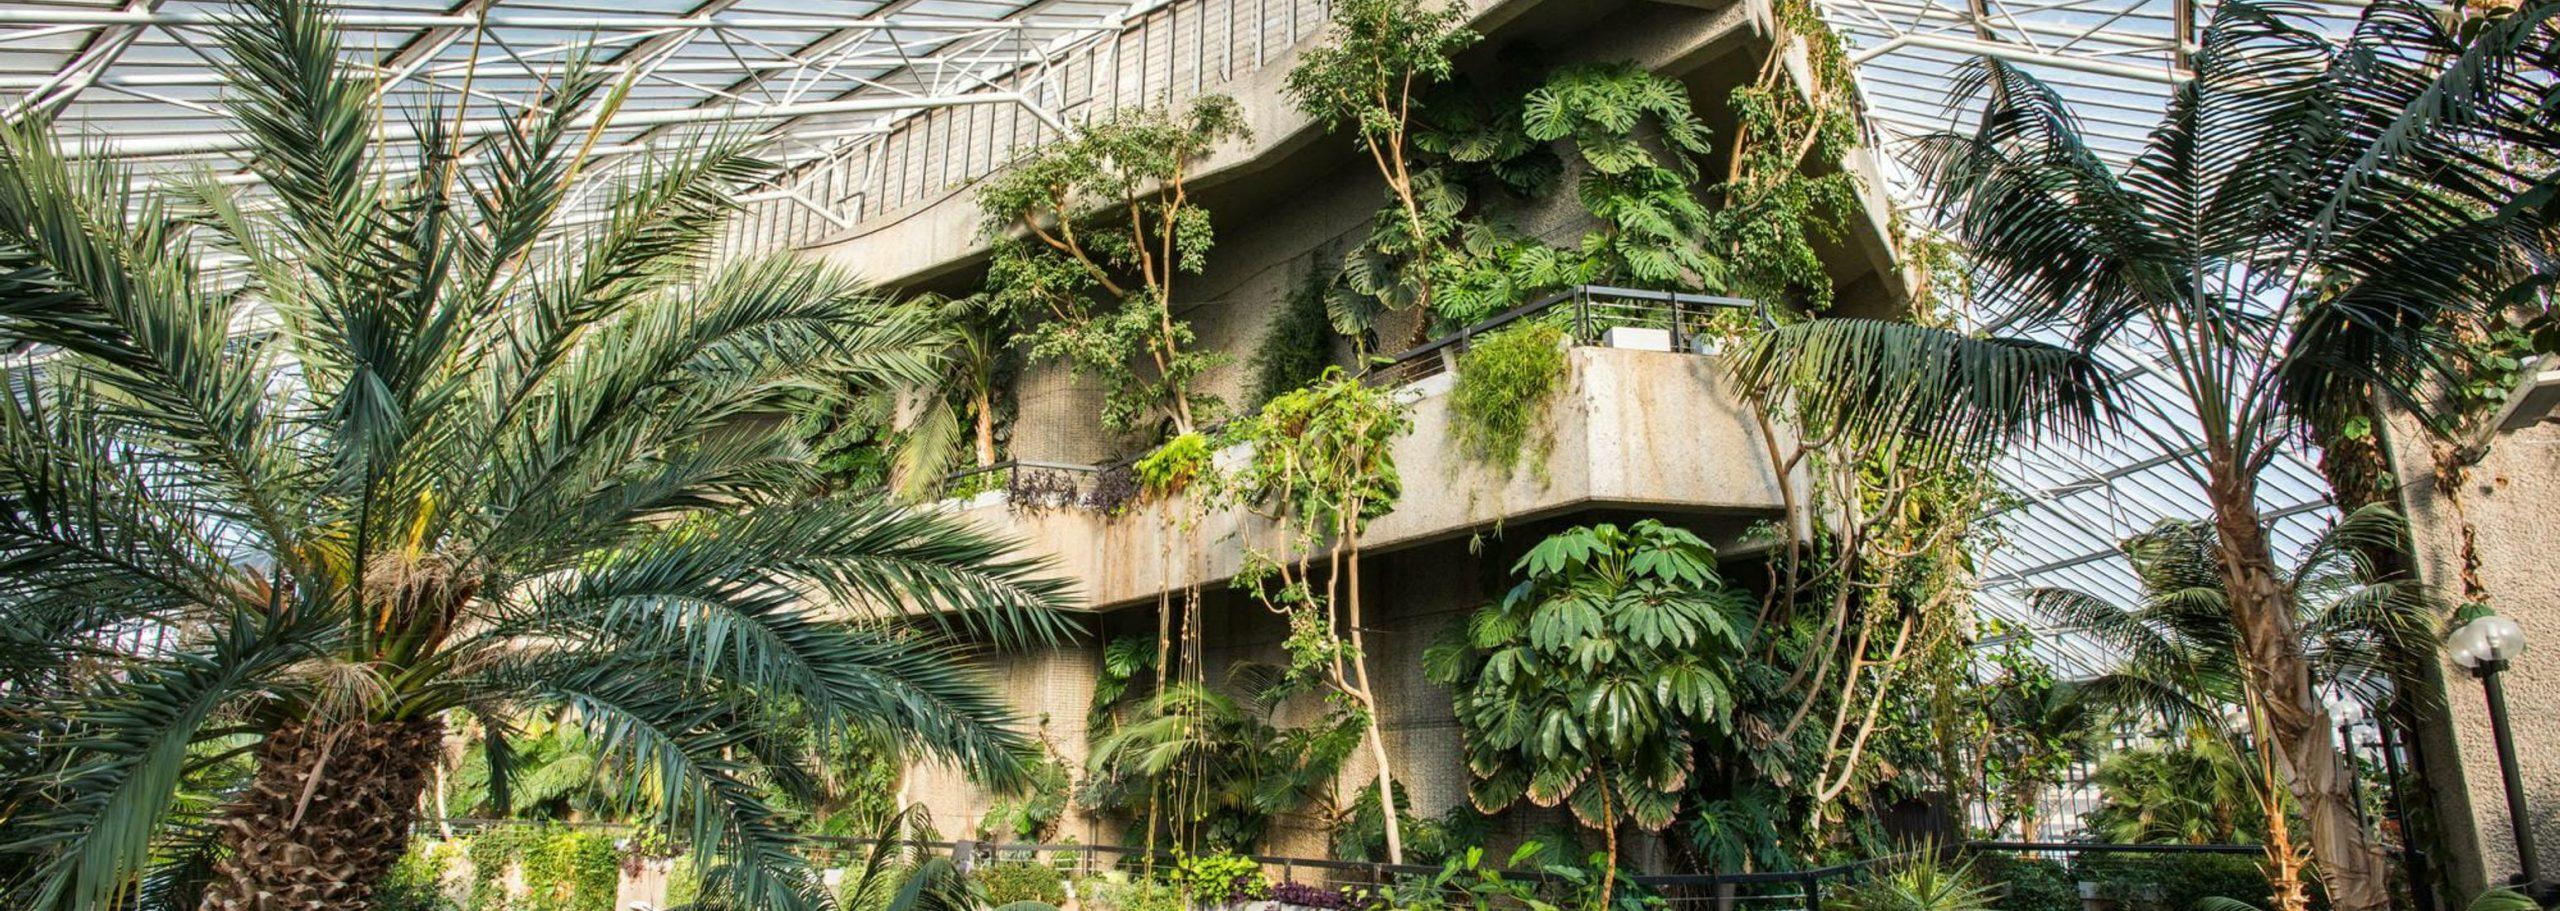 garden conservatory london